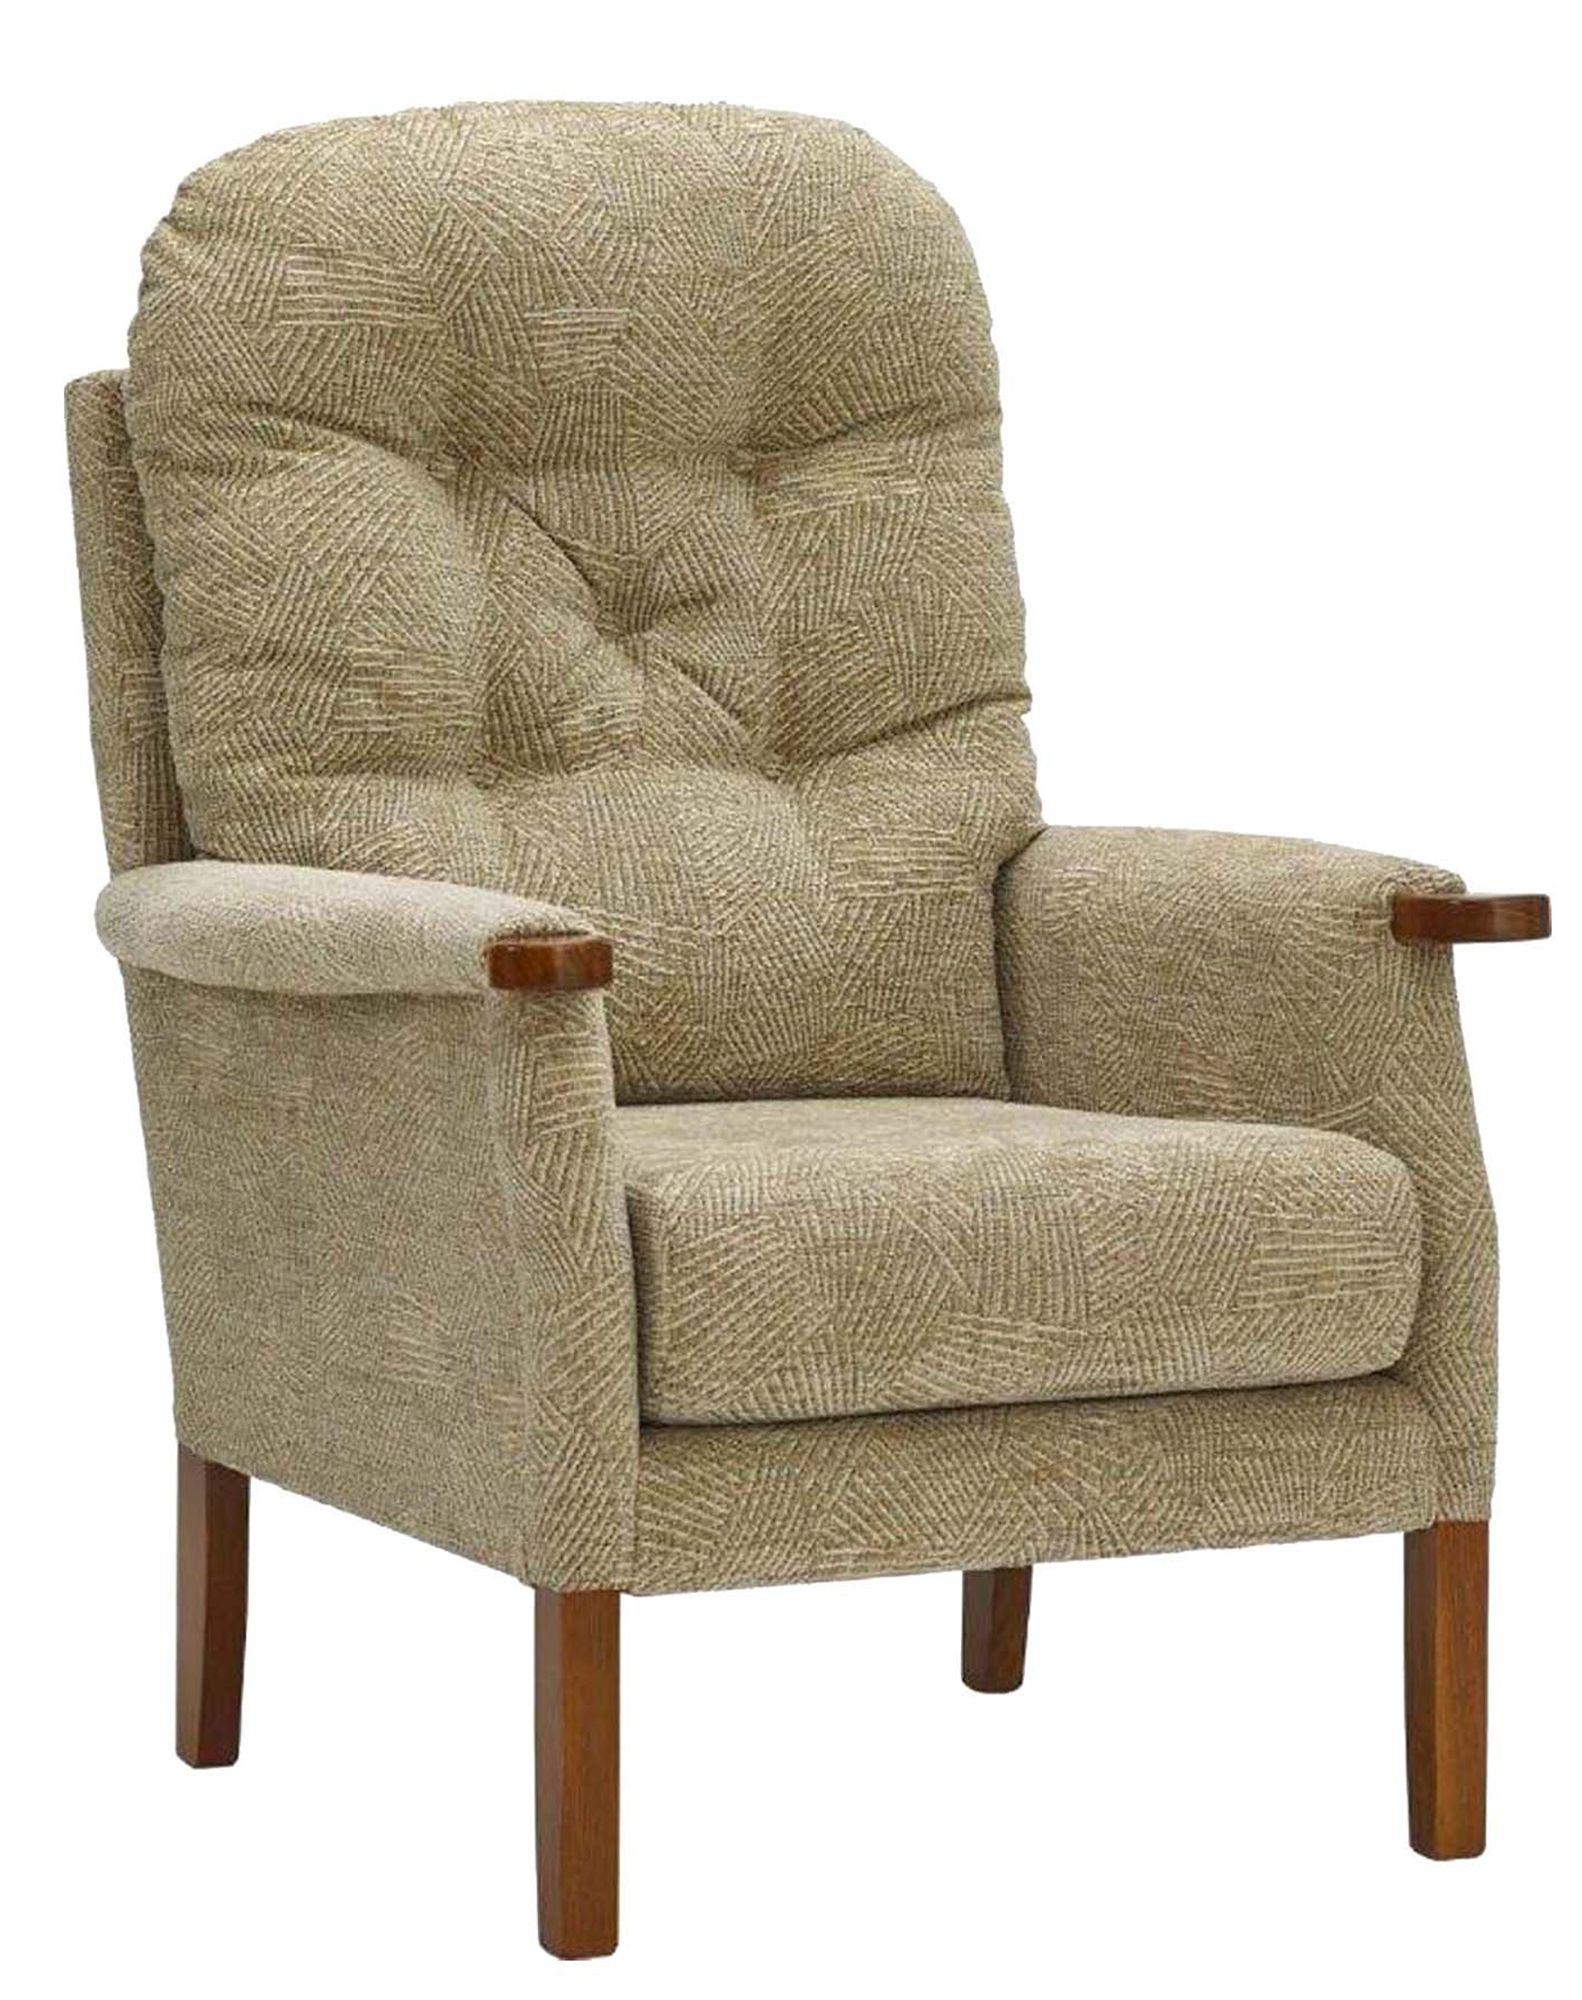 Cintique Eton Chair Fabric C All Living Furniture